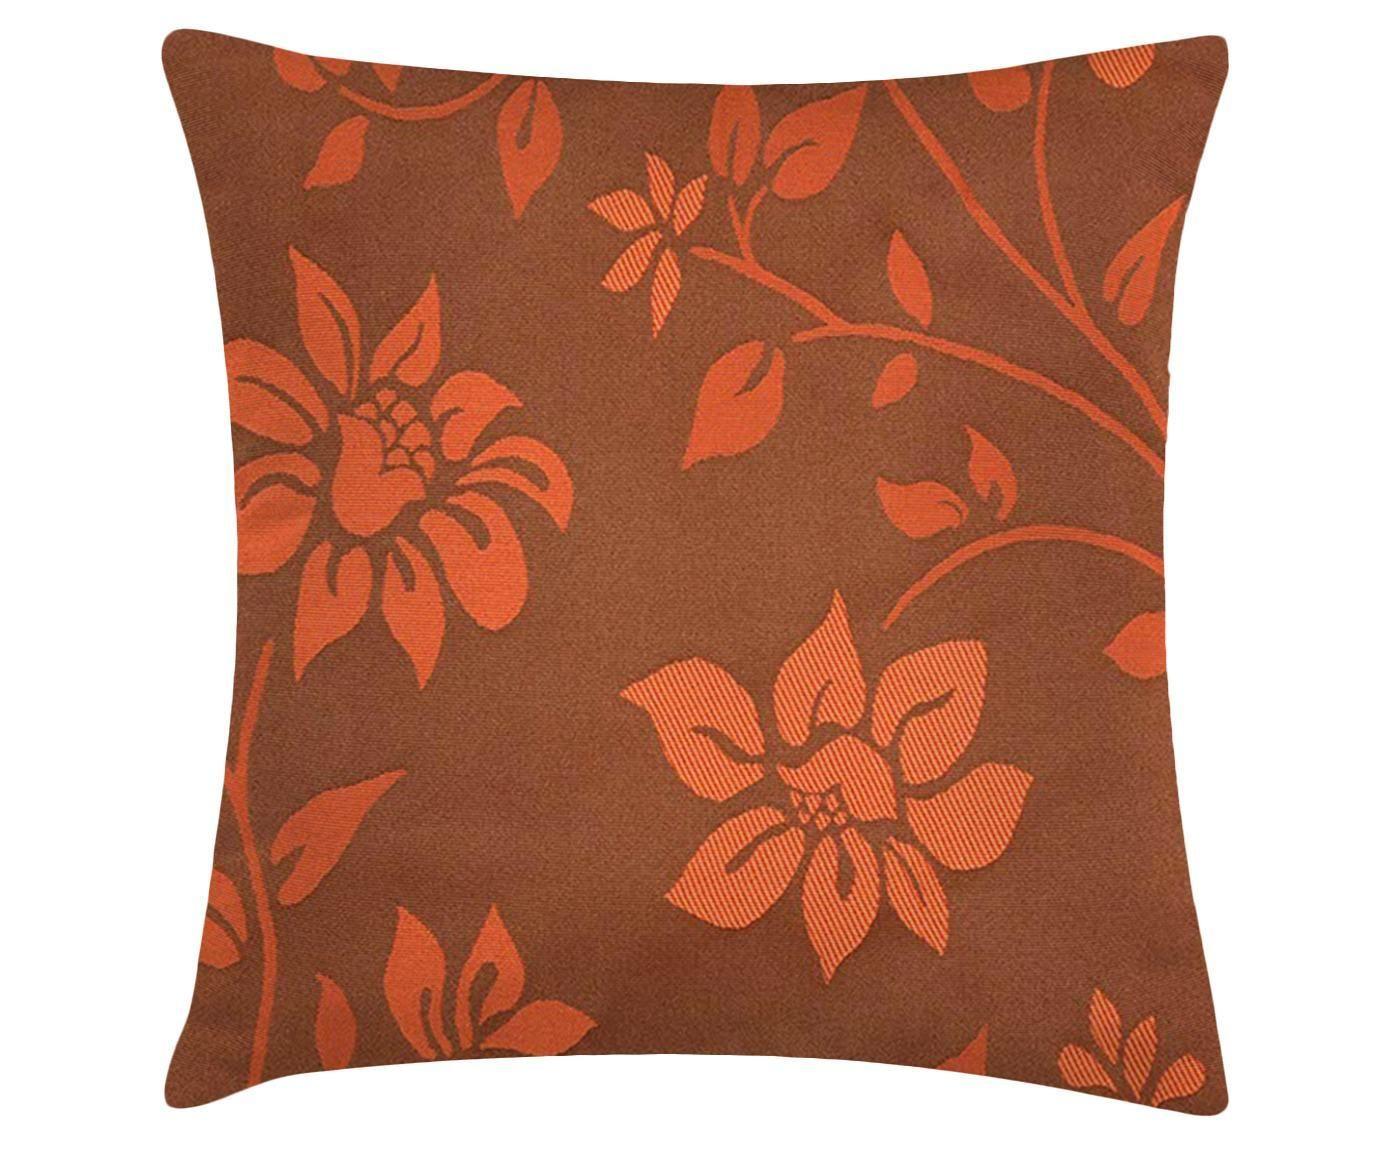 Capa para almofada palmas flowers - ritz   Westwing.com.br